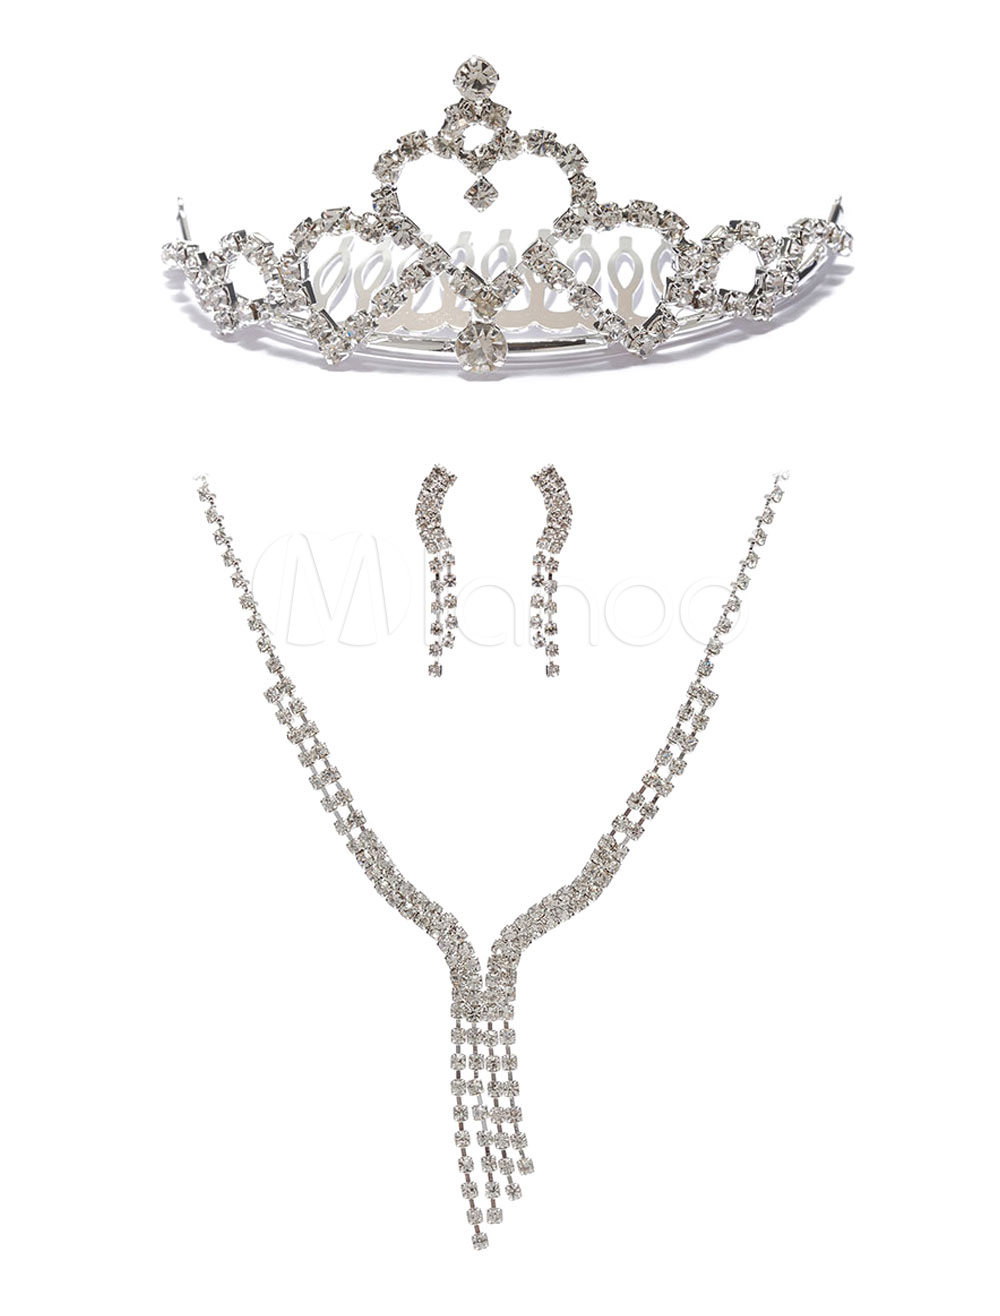 Wedding Necklace Sets Rhinestones Pierced Earrings Tiara Silver Bridal Jewelry Set